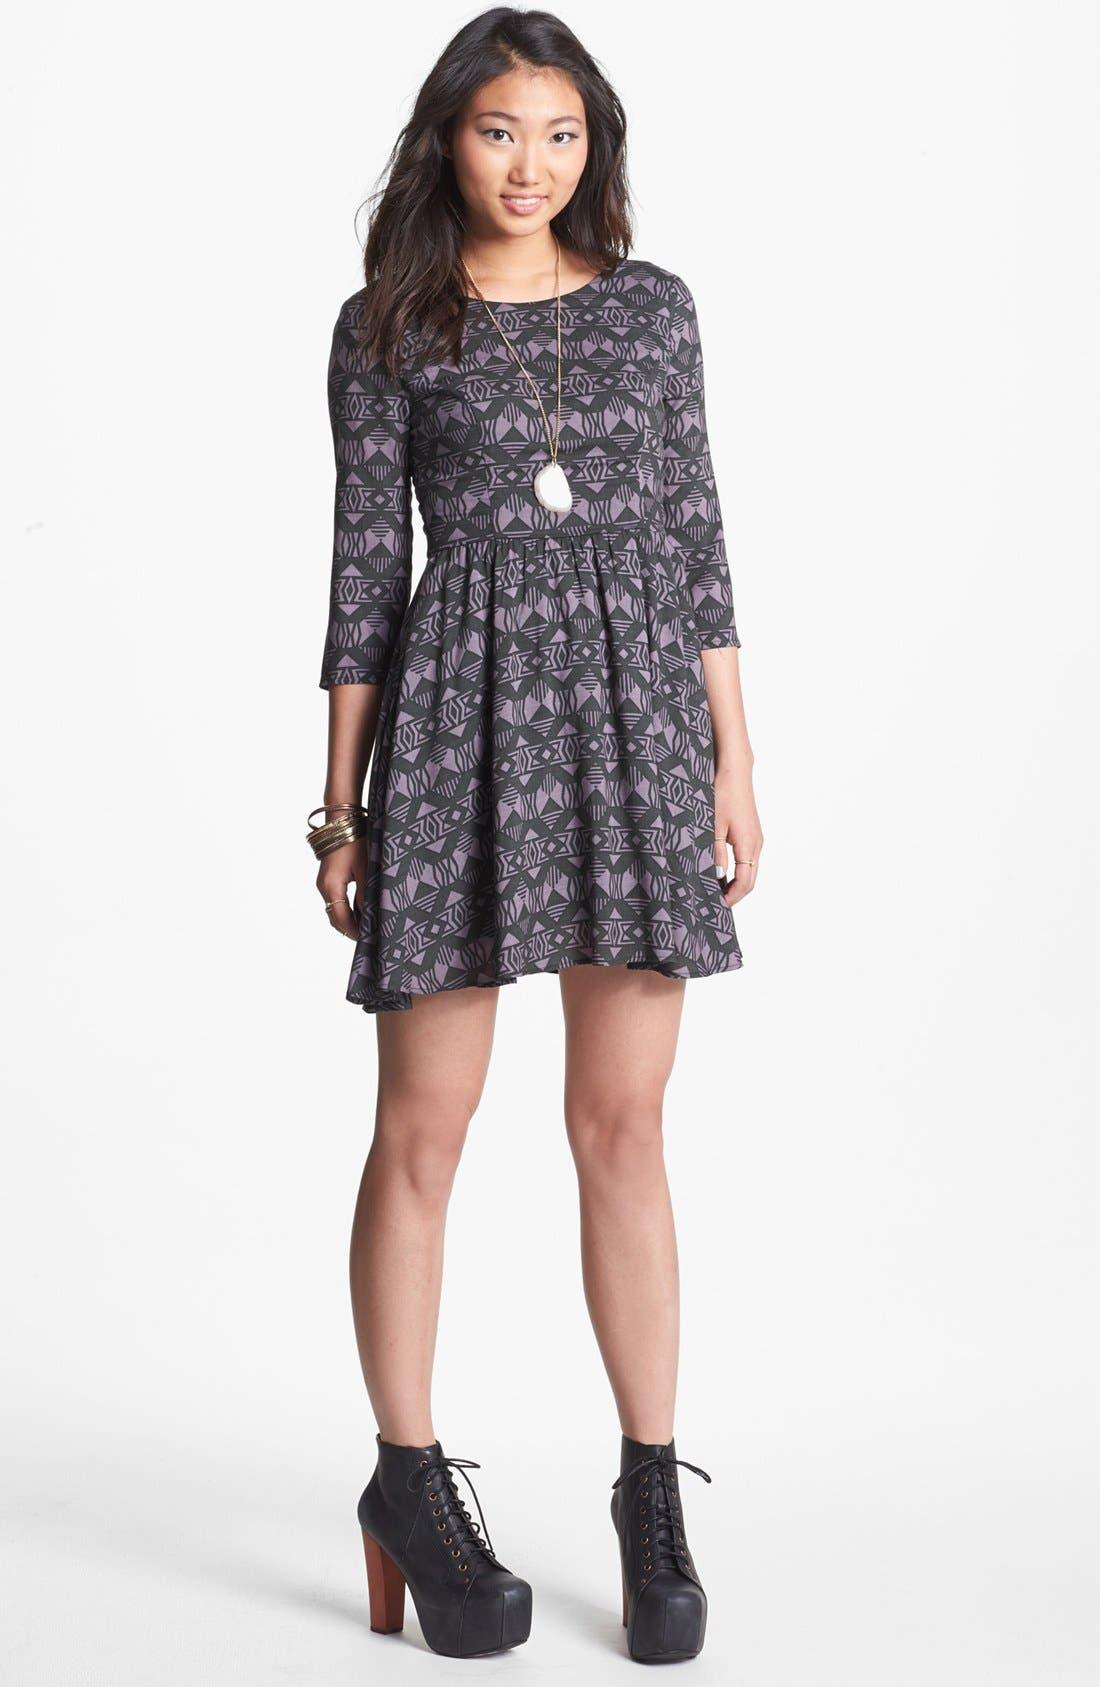 Alternate Image 1 Selected - Lush Lace Up Skater Dress (Juniors)